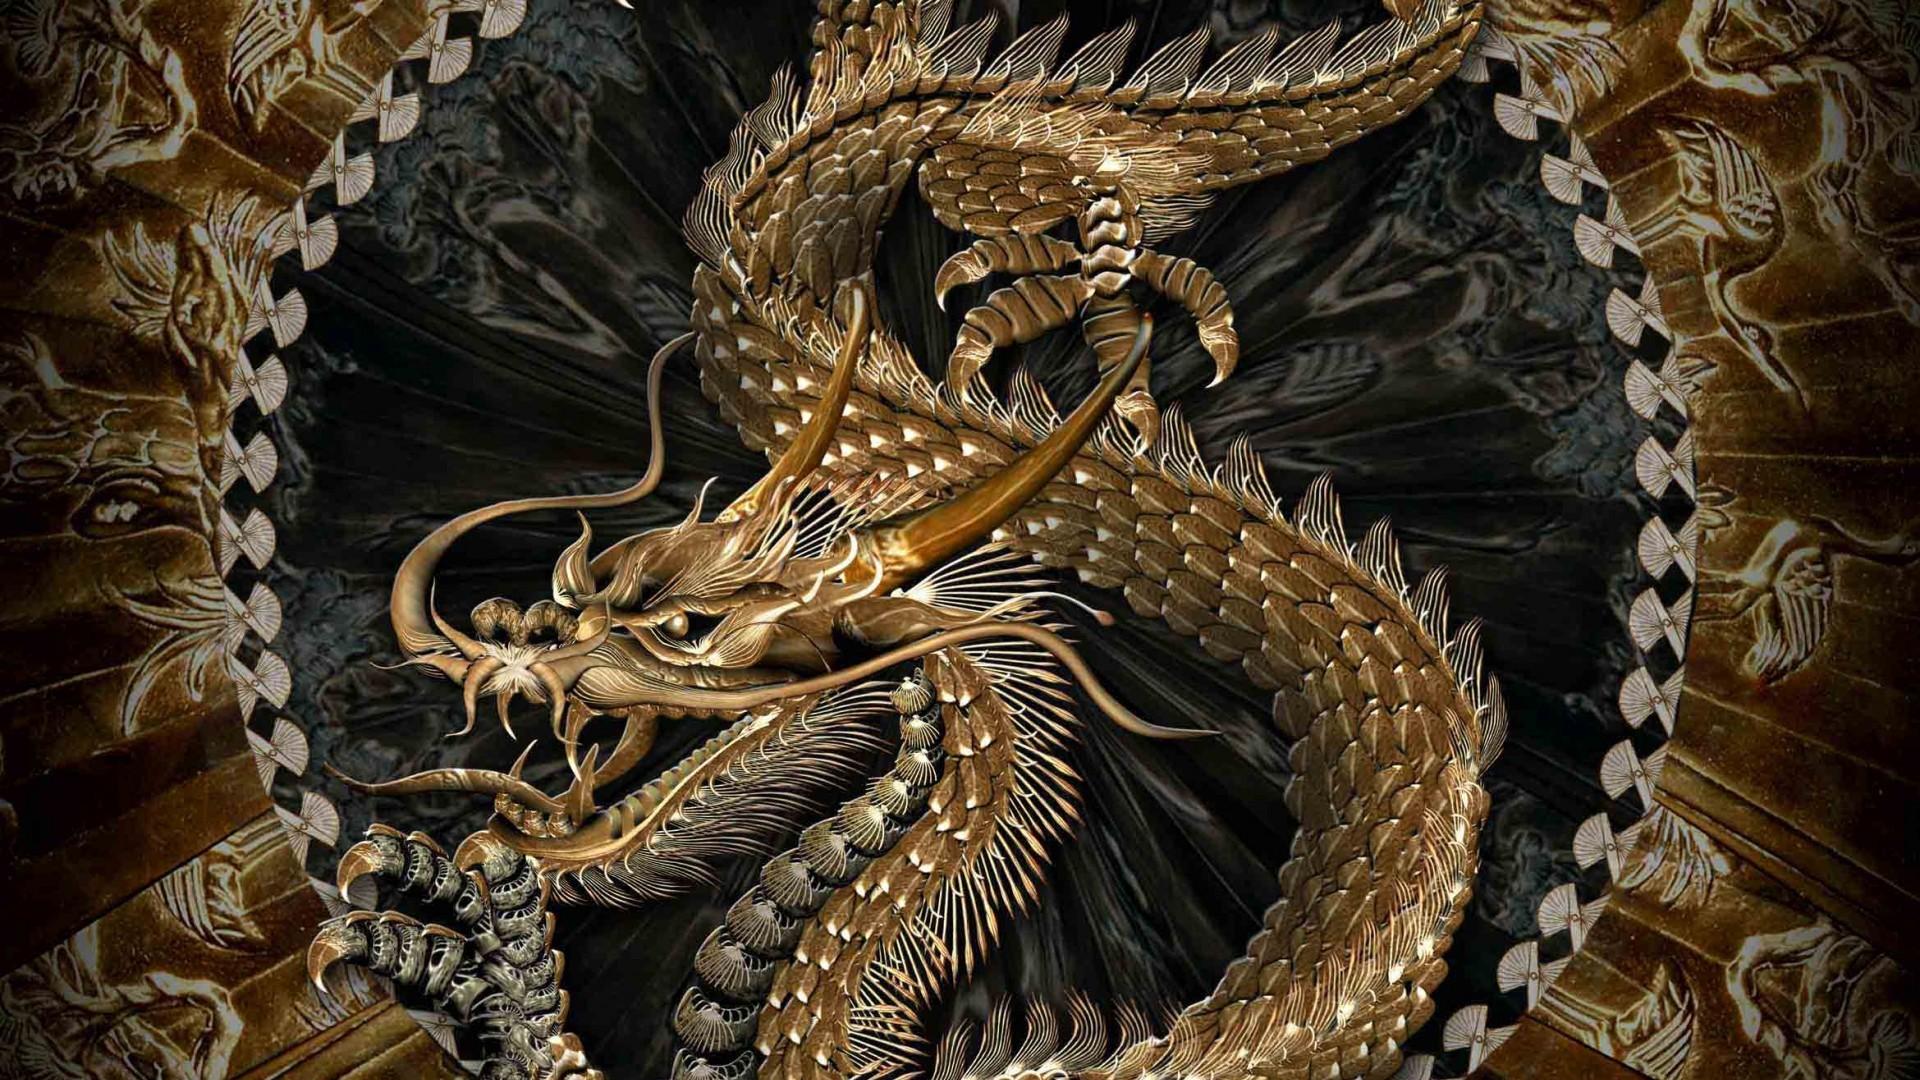 dragon wallpaper hd 1080p hd wallpapers 1920x1080